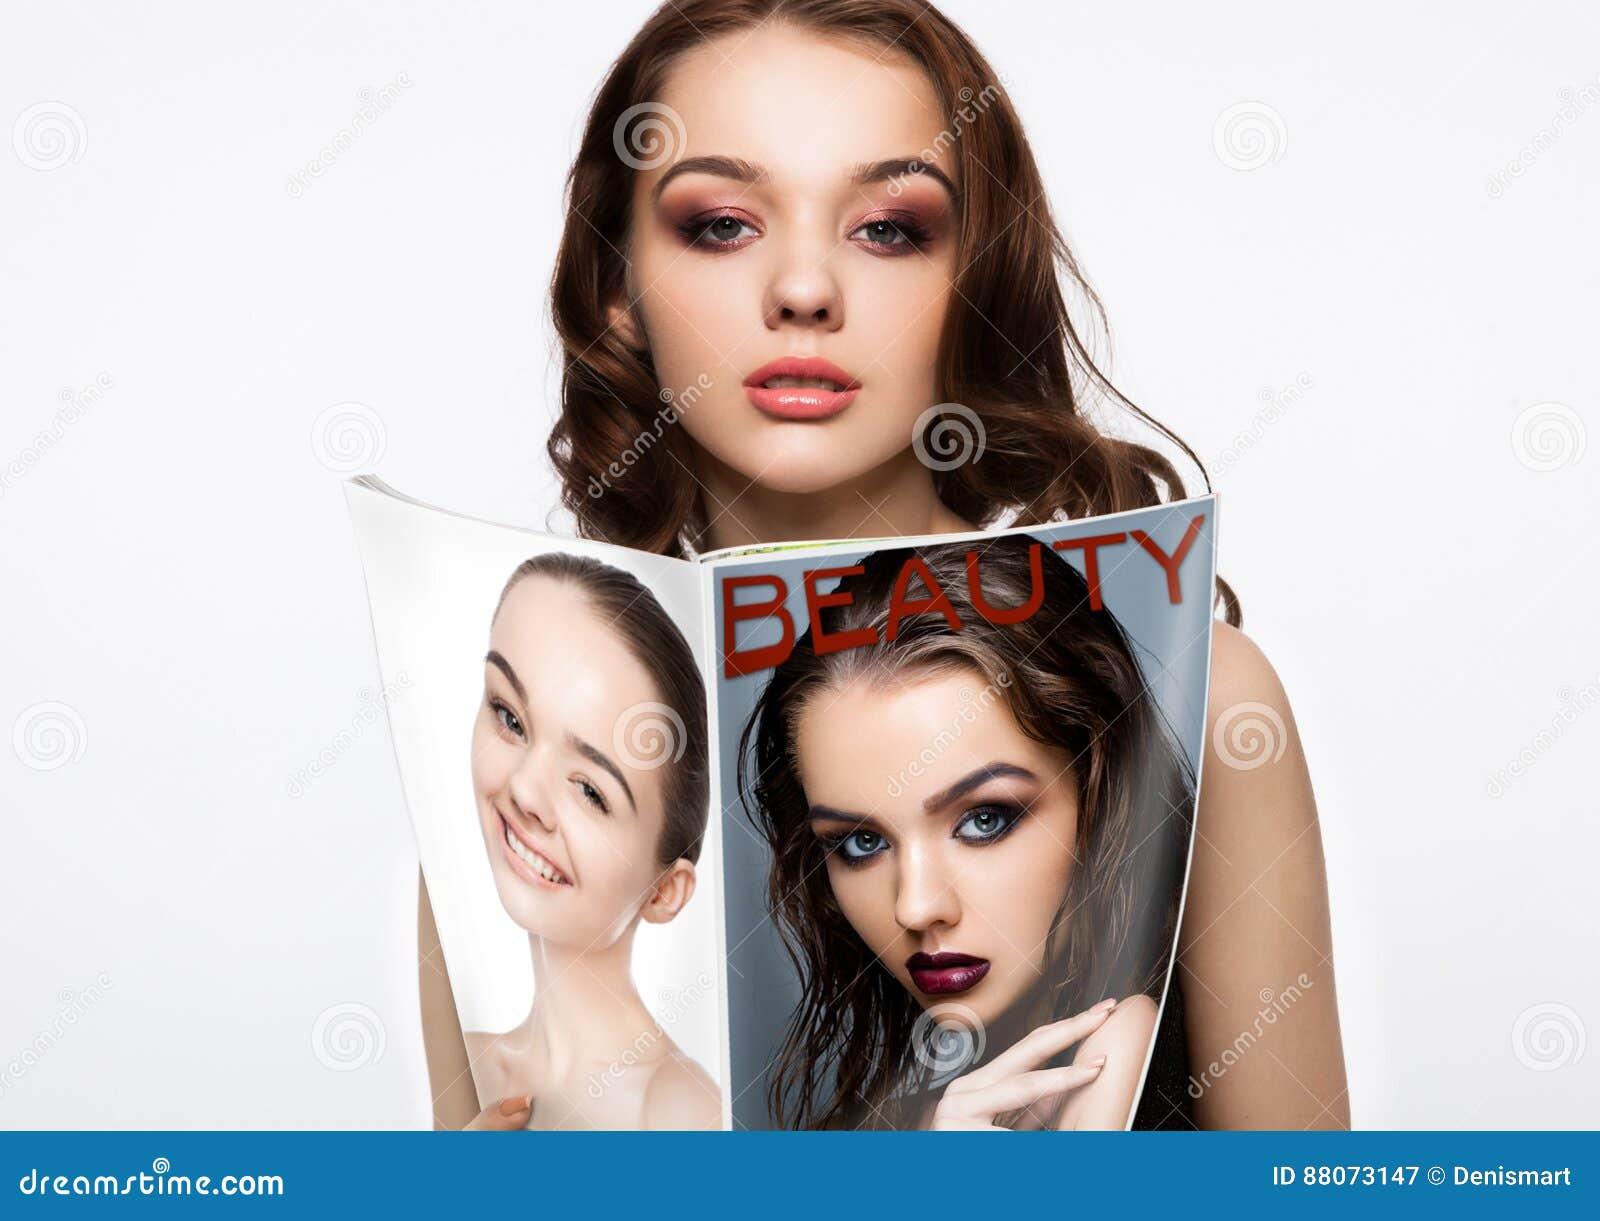 Beautiful Girl Holding Fashion Beauty Magazine Stock Image